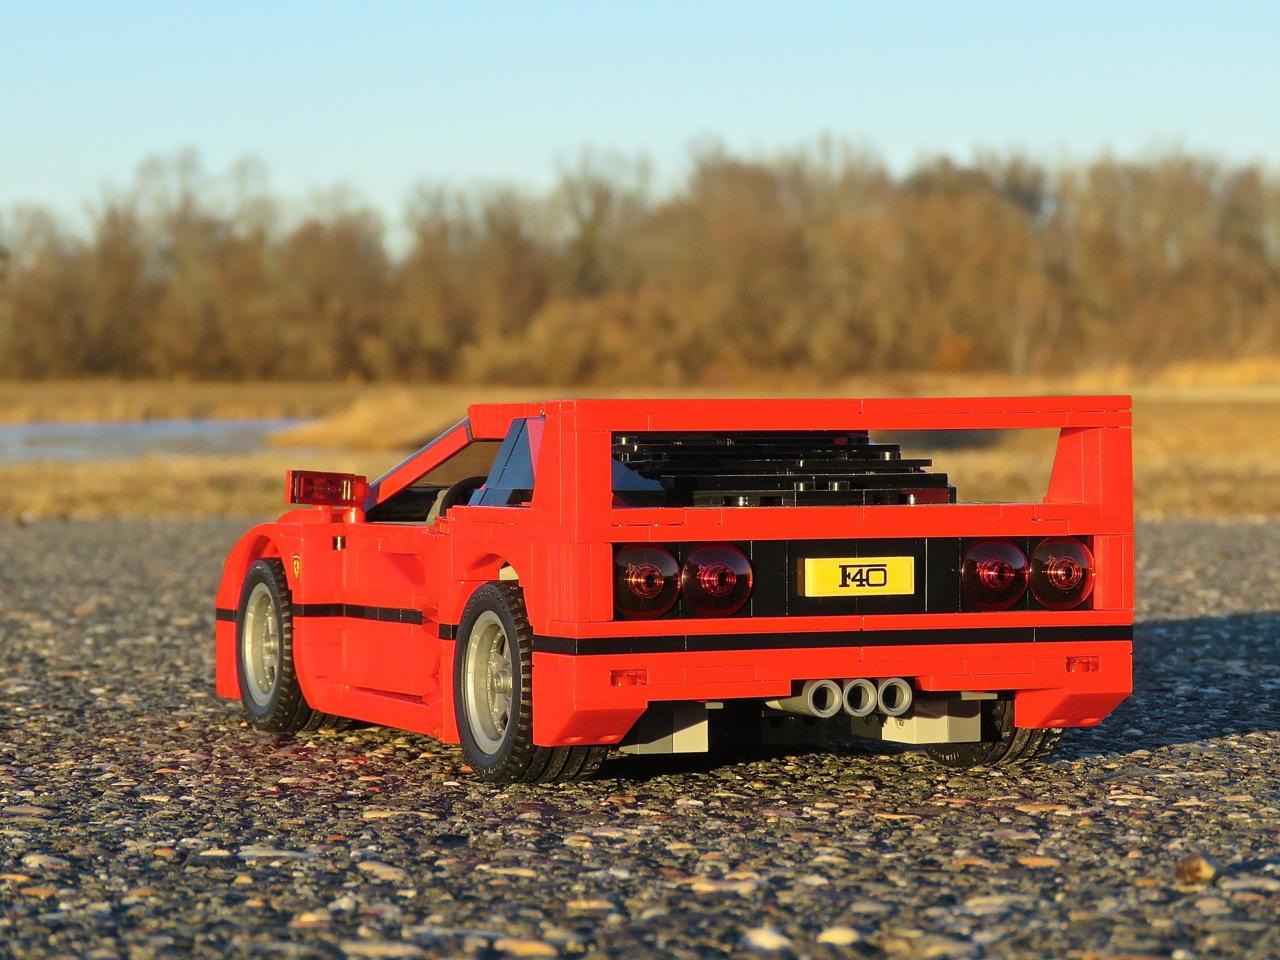 Lego Ferrari F40 3